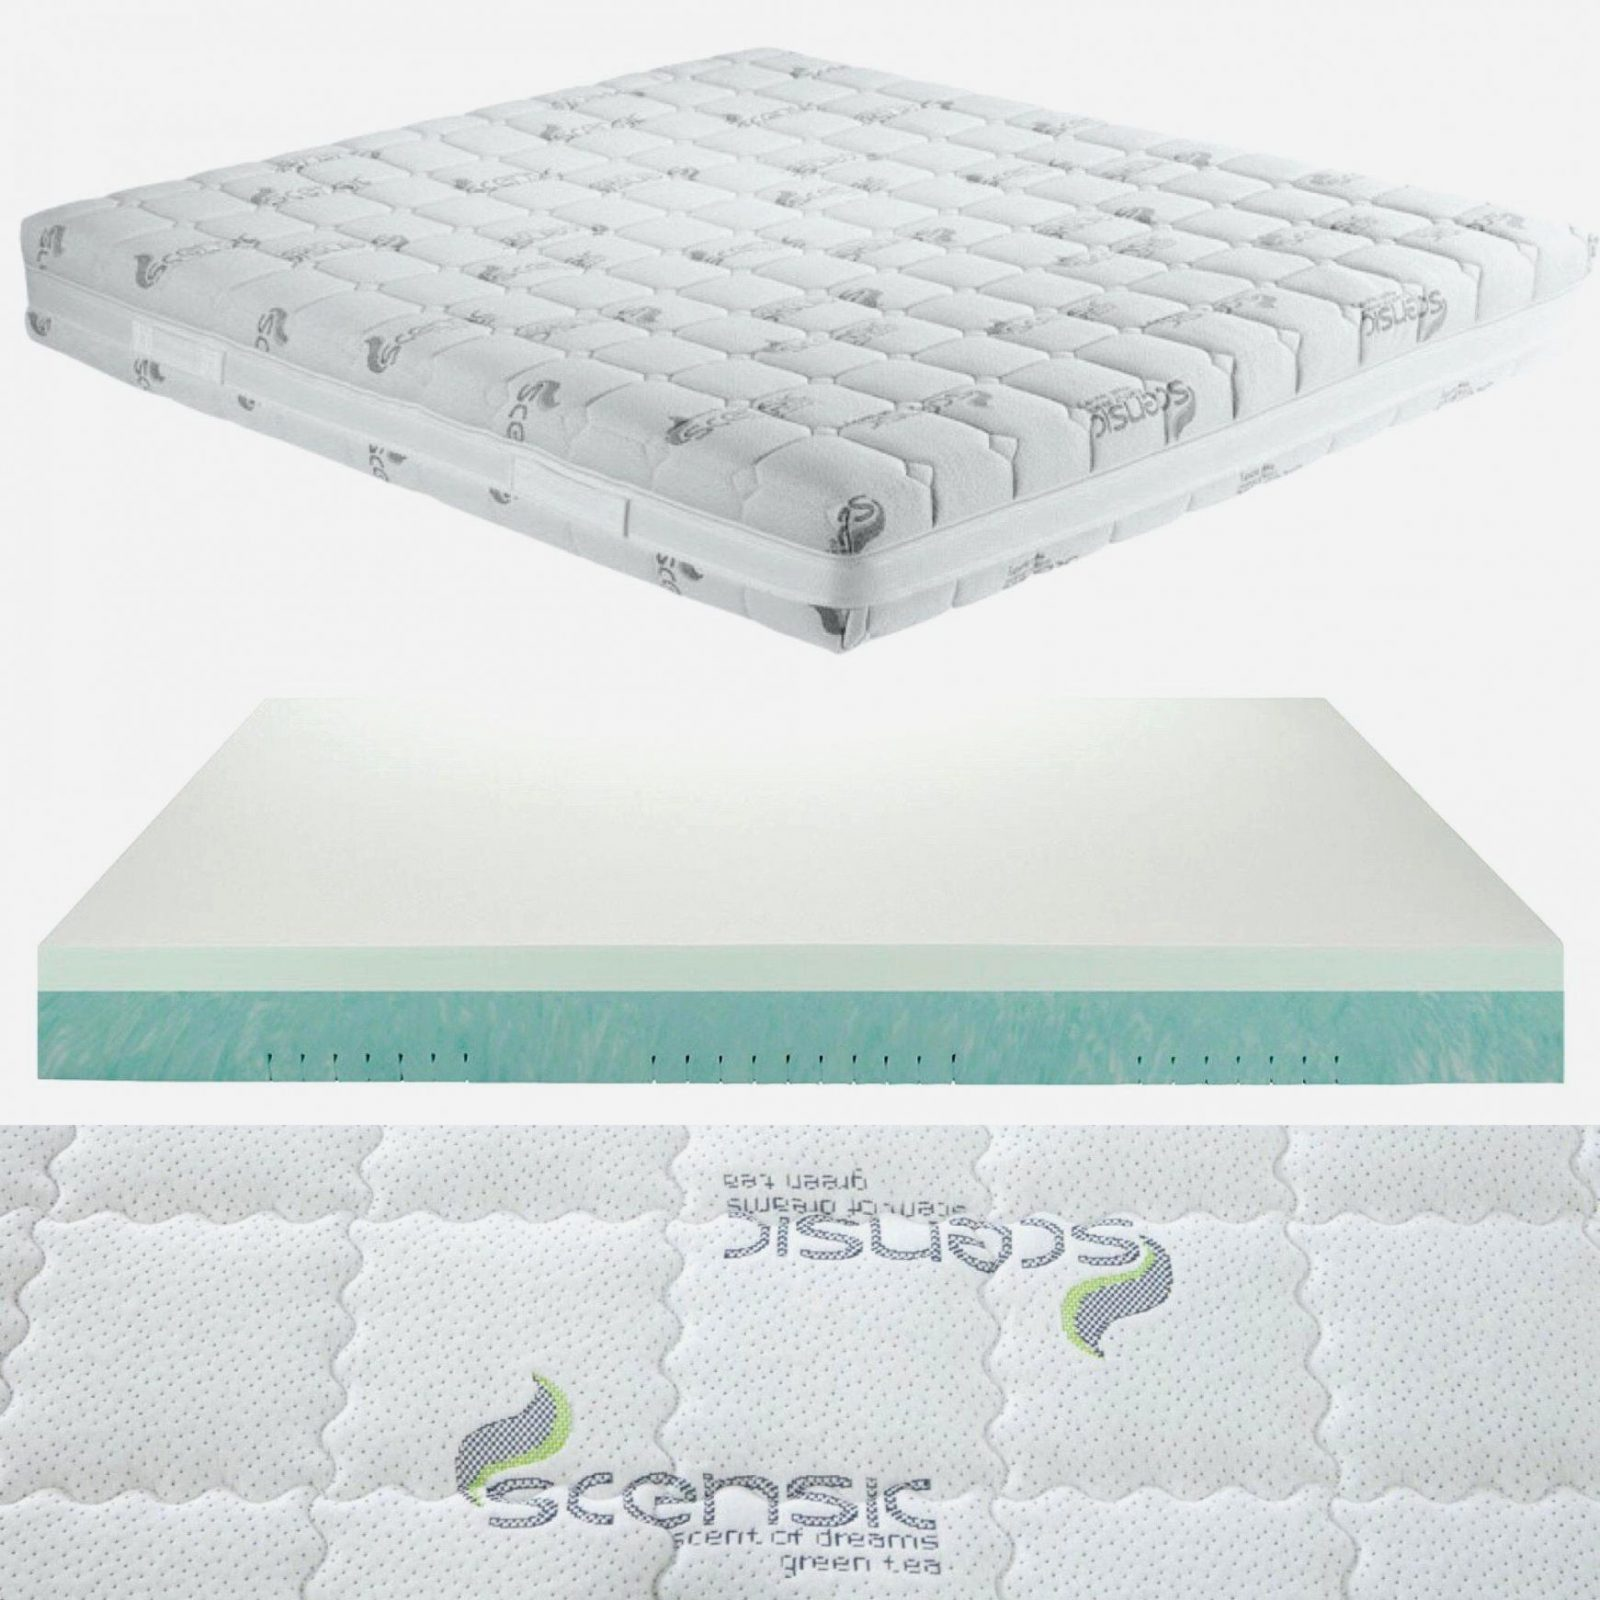 schlaraffia viva plus aqua h3 90x200 haus design ideen. Black Bedroom Furniture Sets. Home Design Ideas